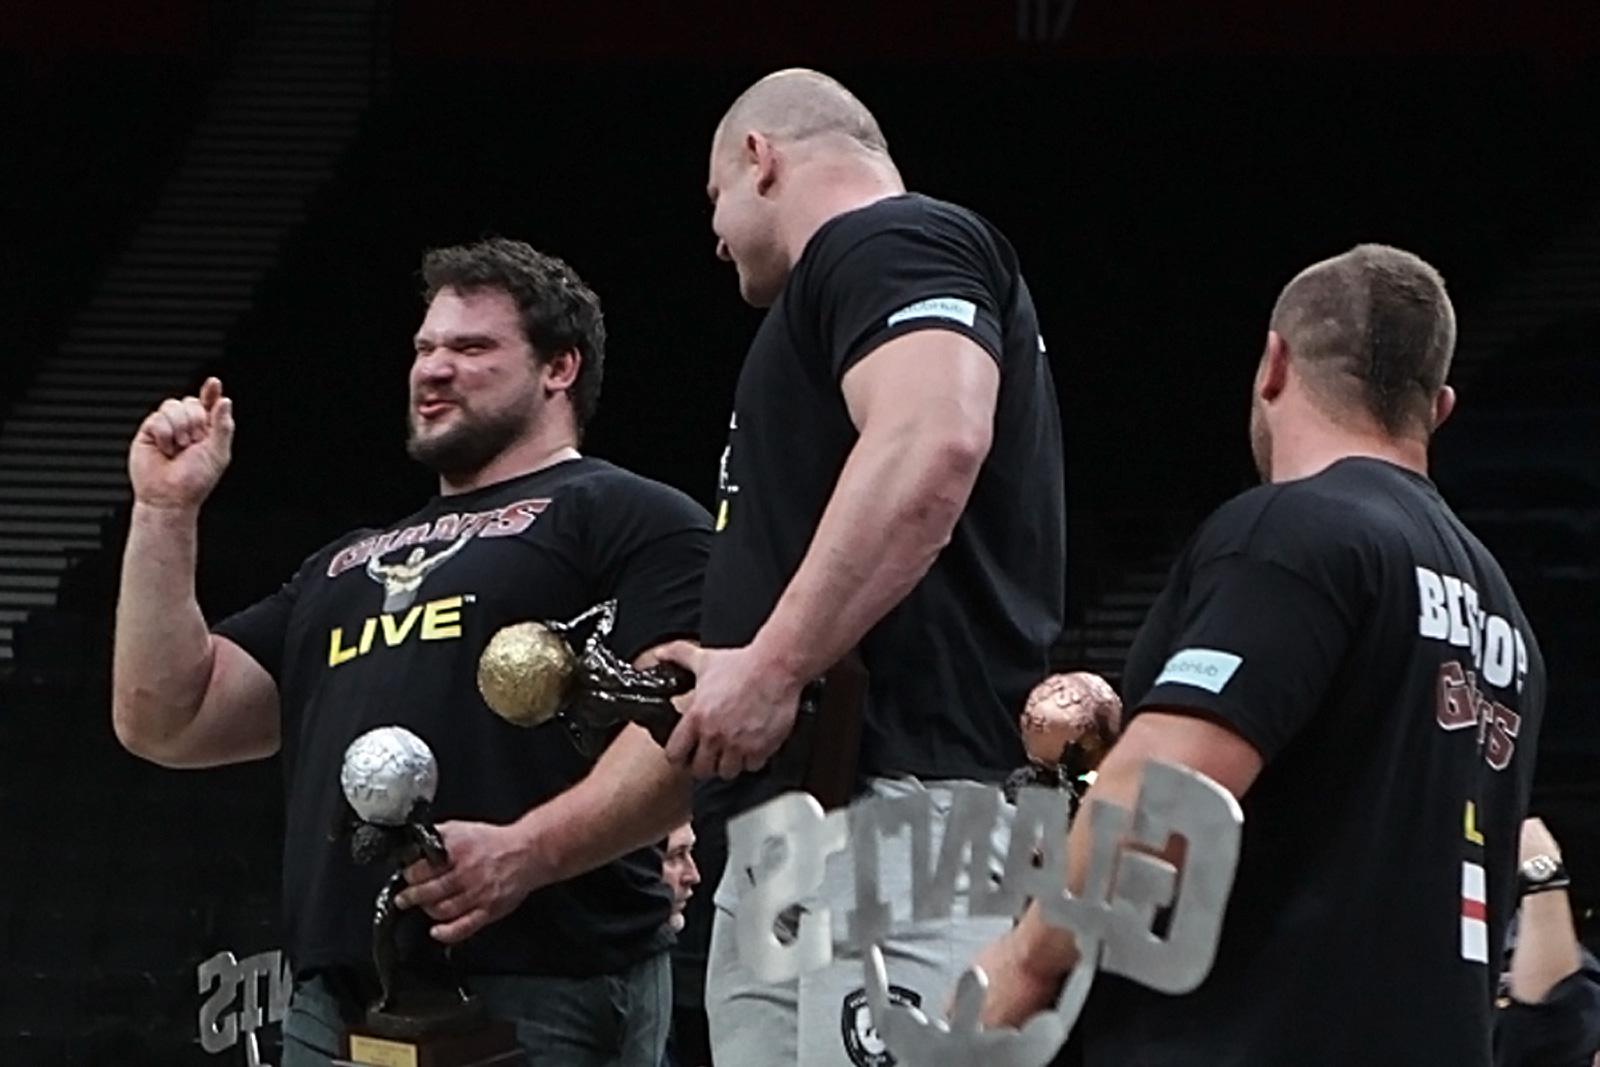 Martins Licis and Mateusz Kieliszkowski